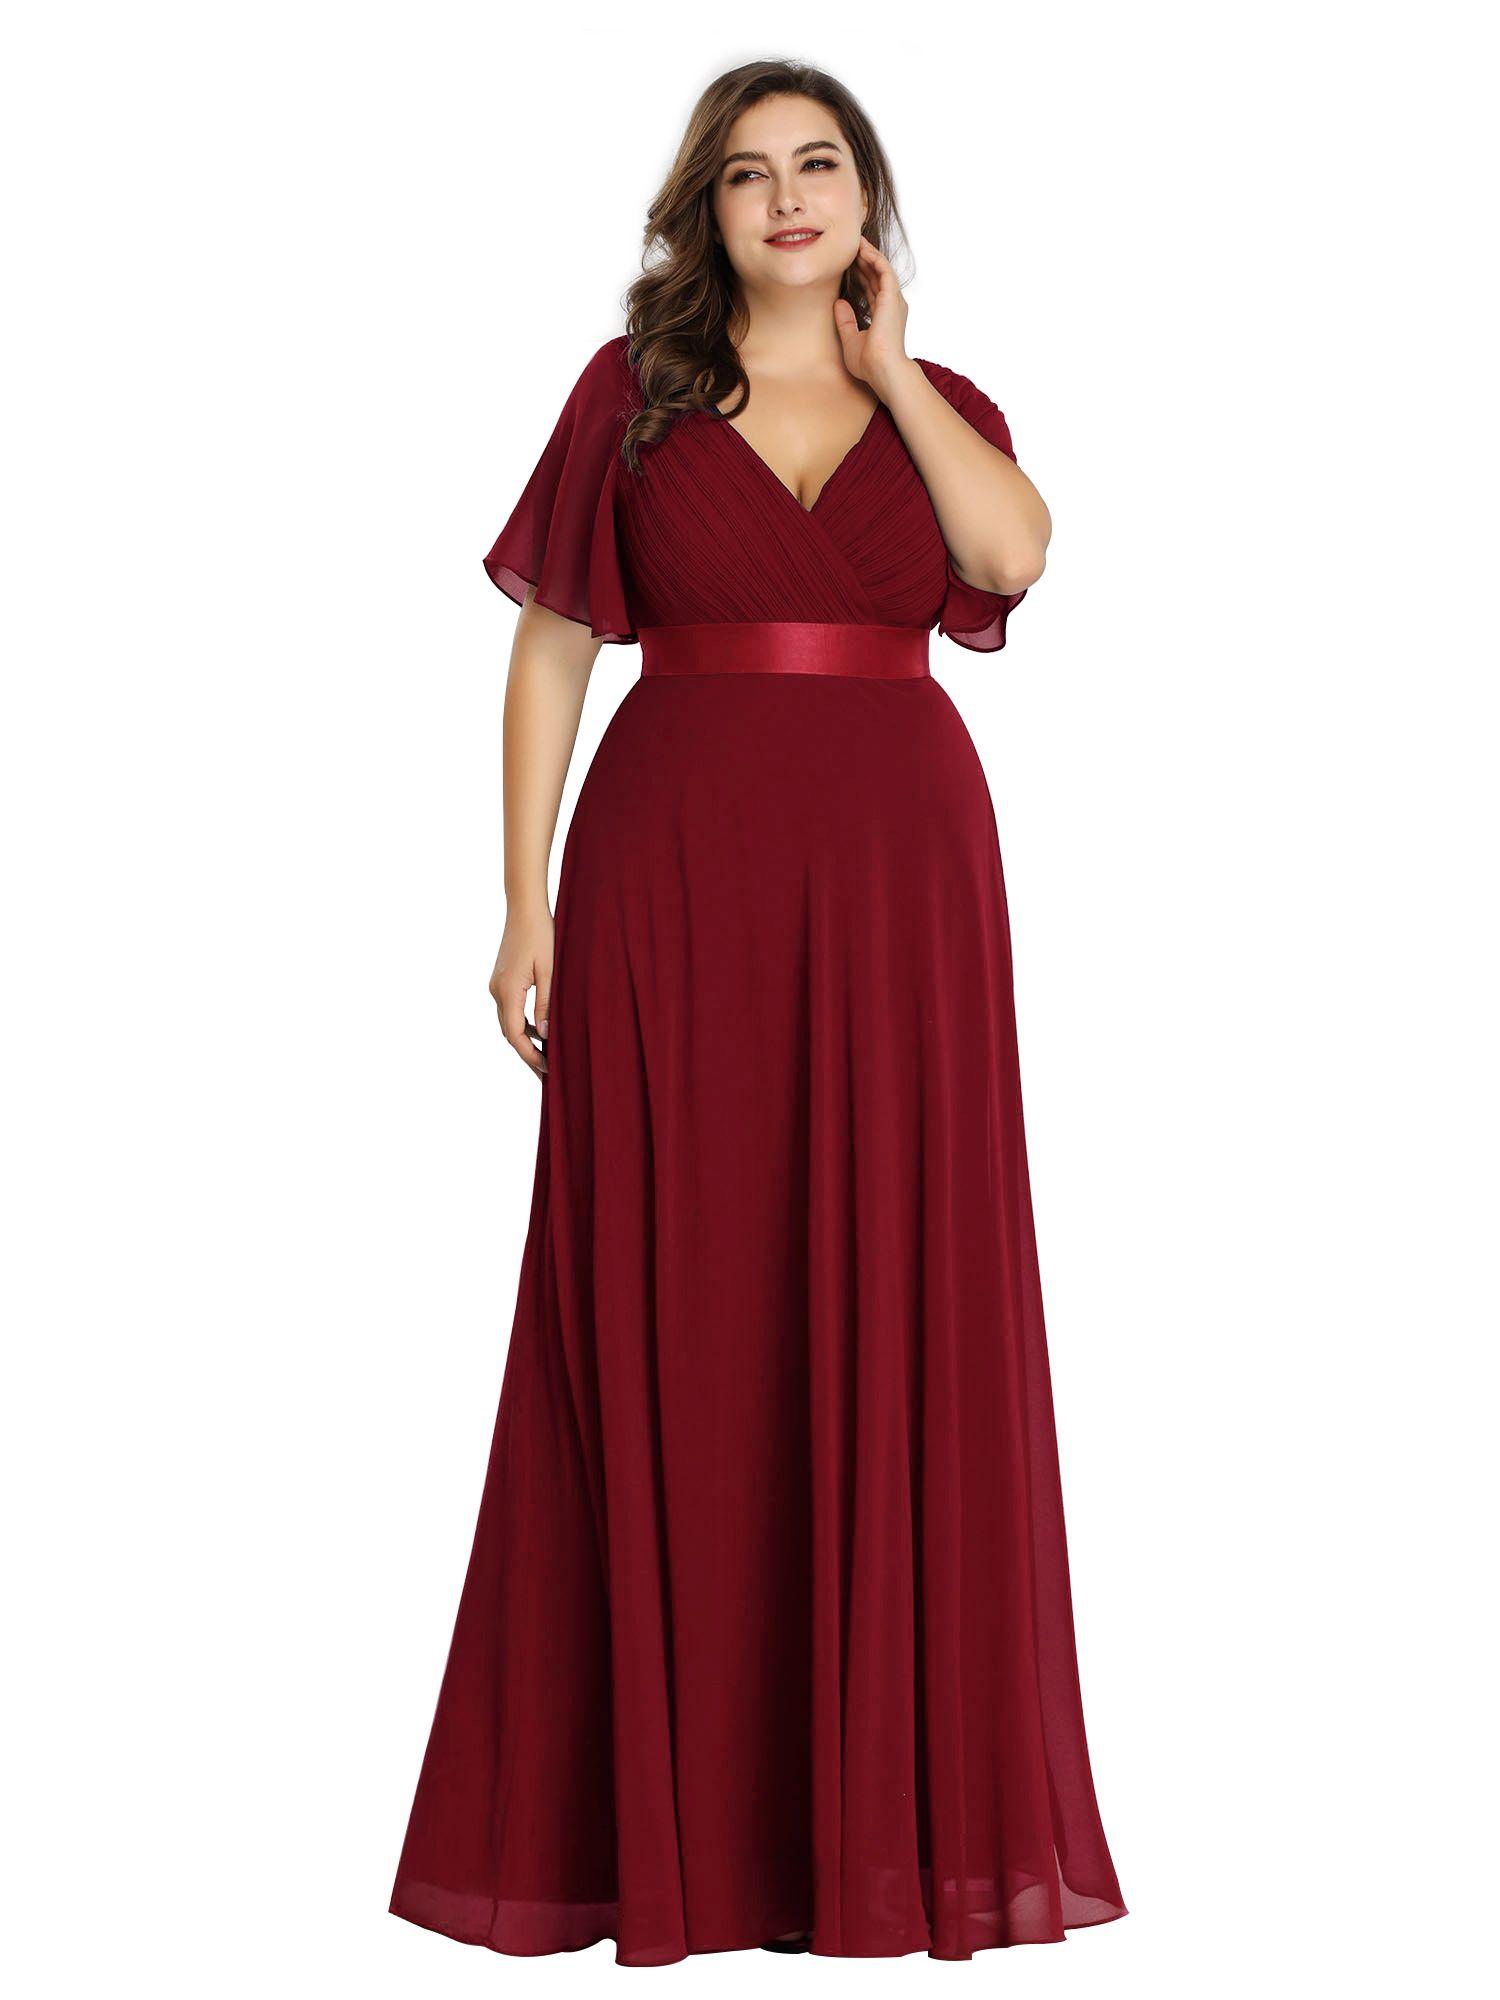 Ever Pretty Ever Pretty Womens Chiffon Long Formal Evening Dresses For Women 98902 Burgundy Us4 Walmart Com Bridesmaid Dresses Plus Size Empire Waist Evening Dress Formal Evening Dresses [ 2000 x 1500 Pixel ]